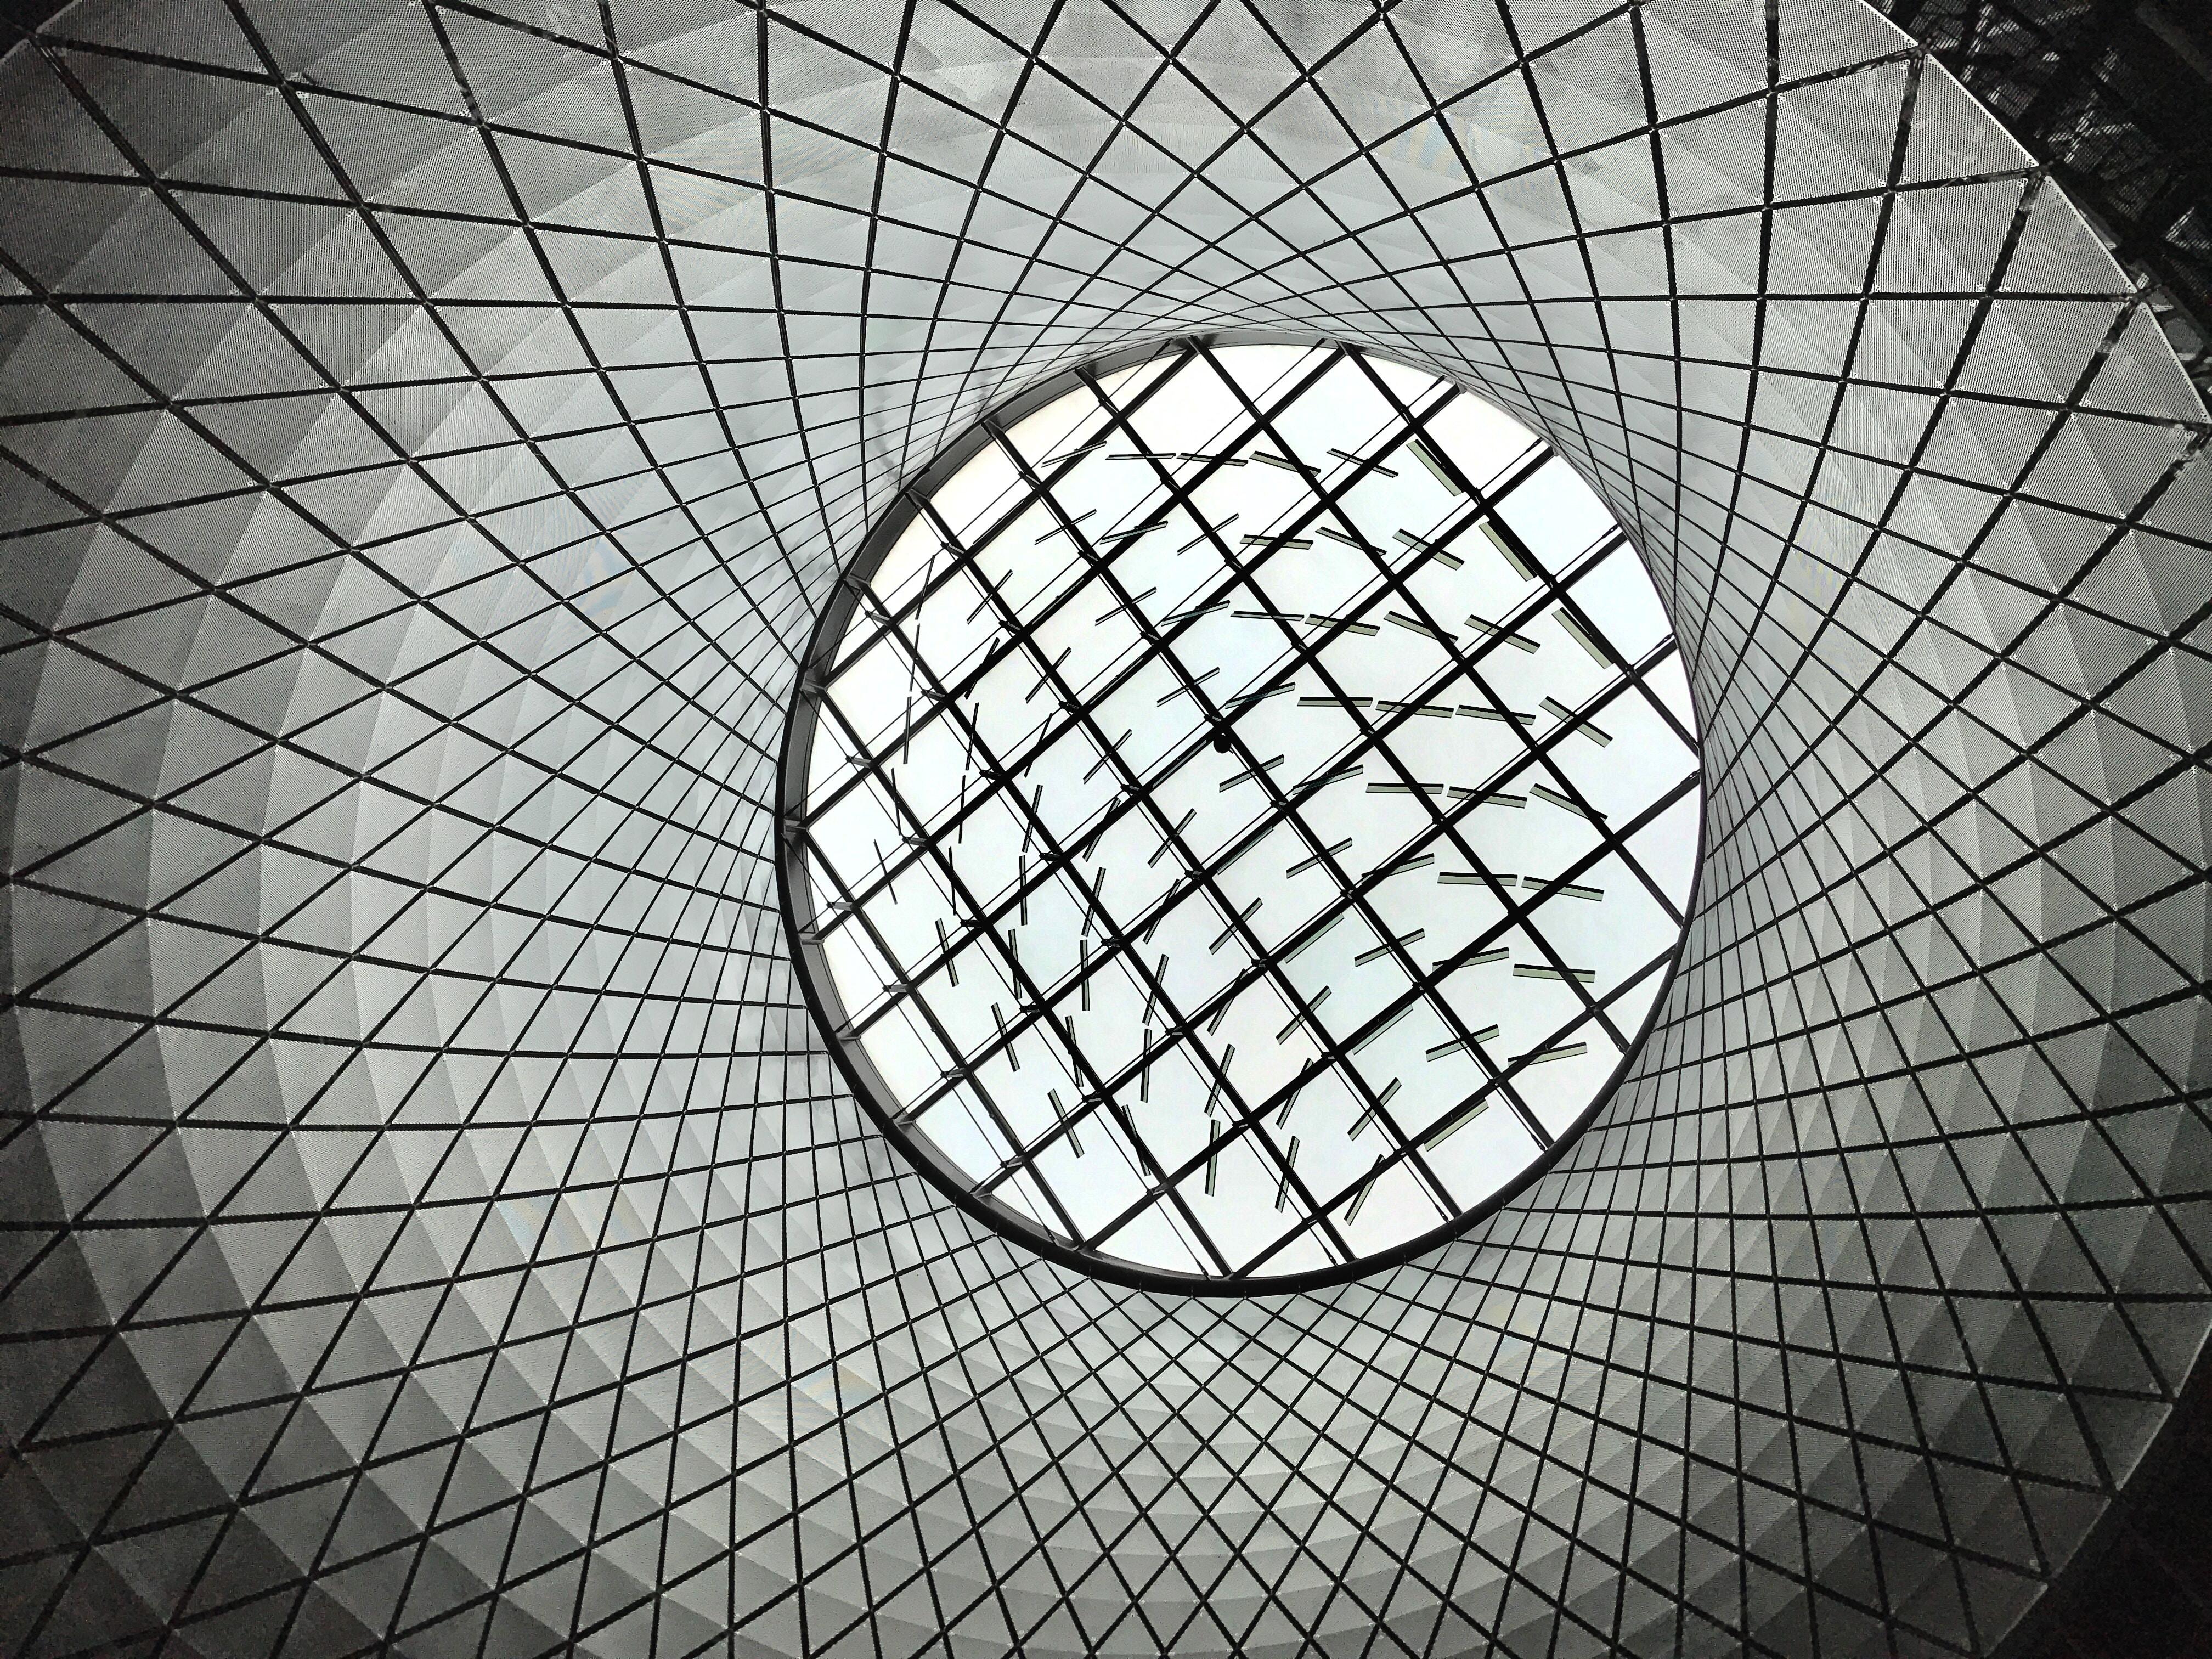 gray and white optical illusion